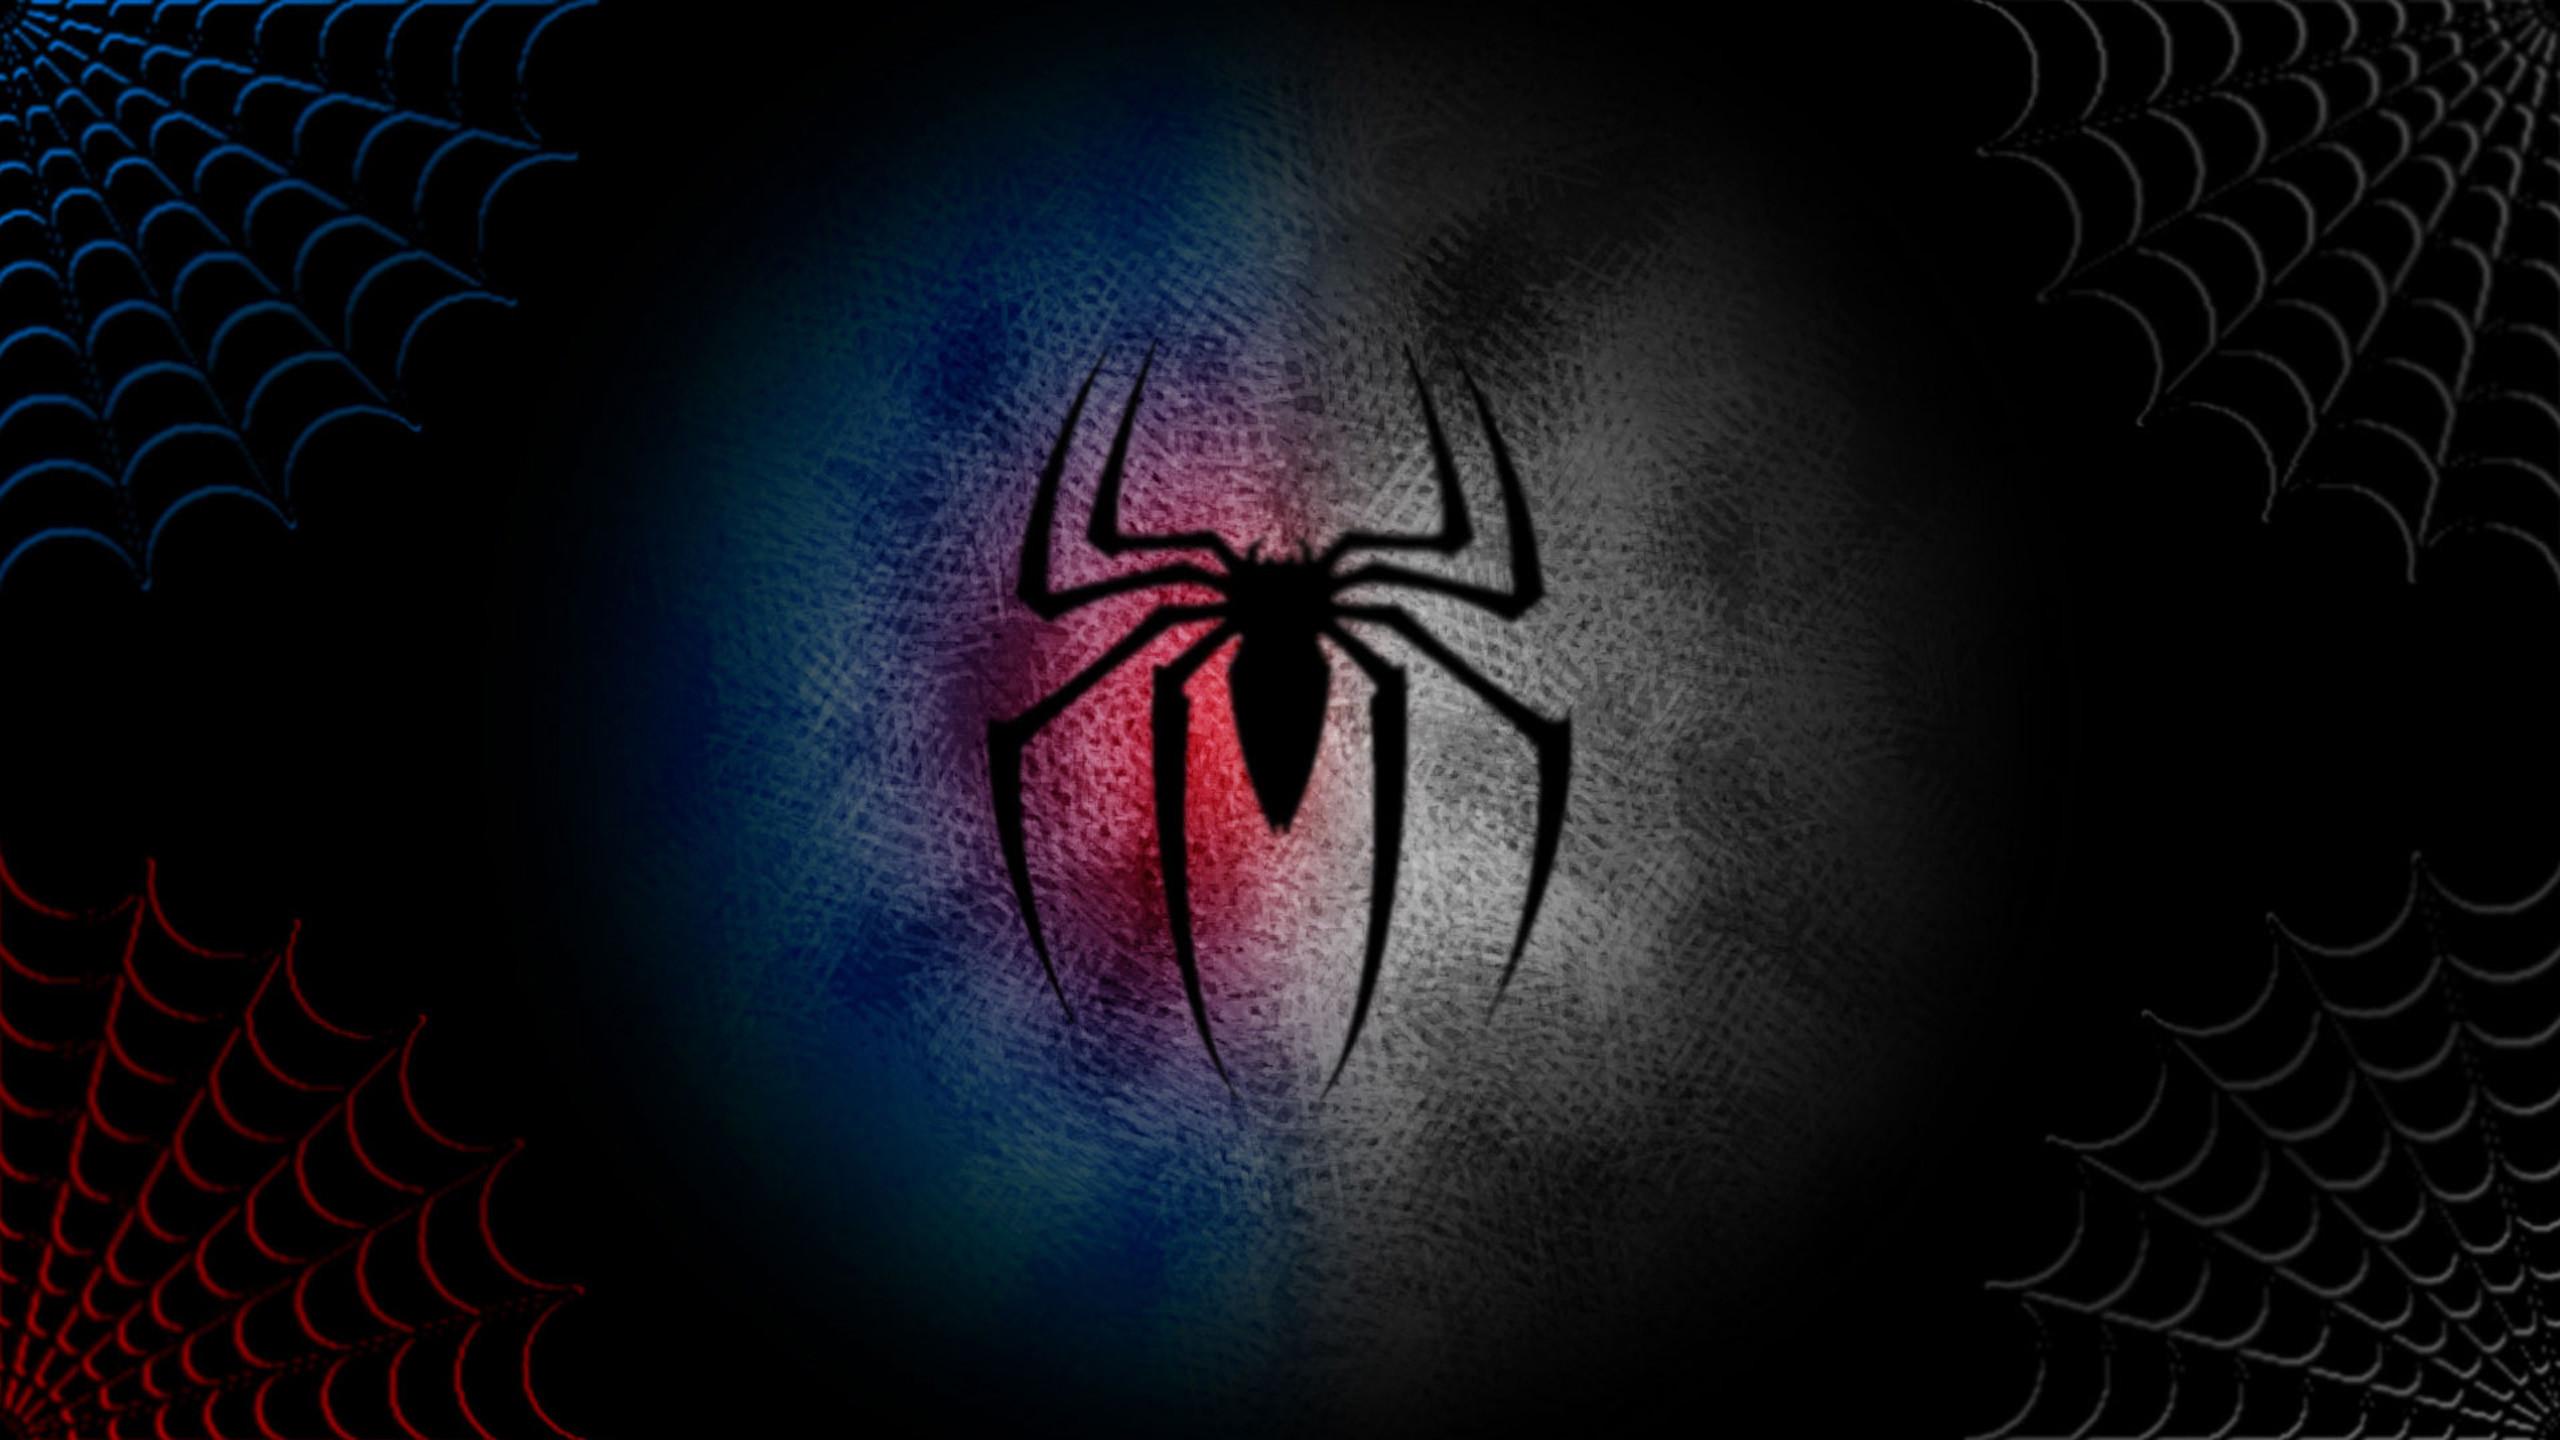 Hd Spiderman Logo Wallpaper 71 Images